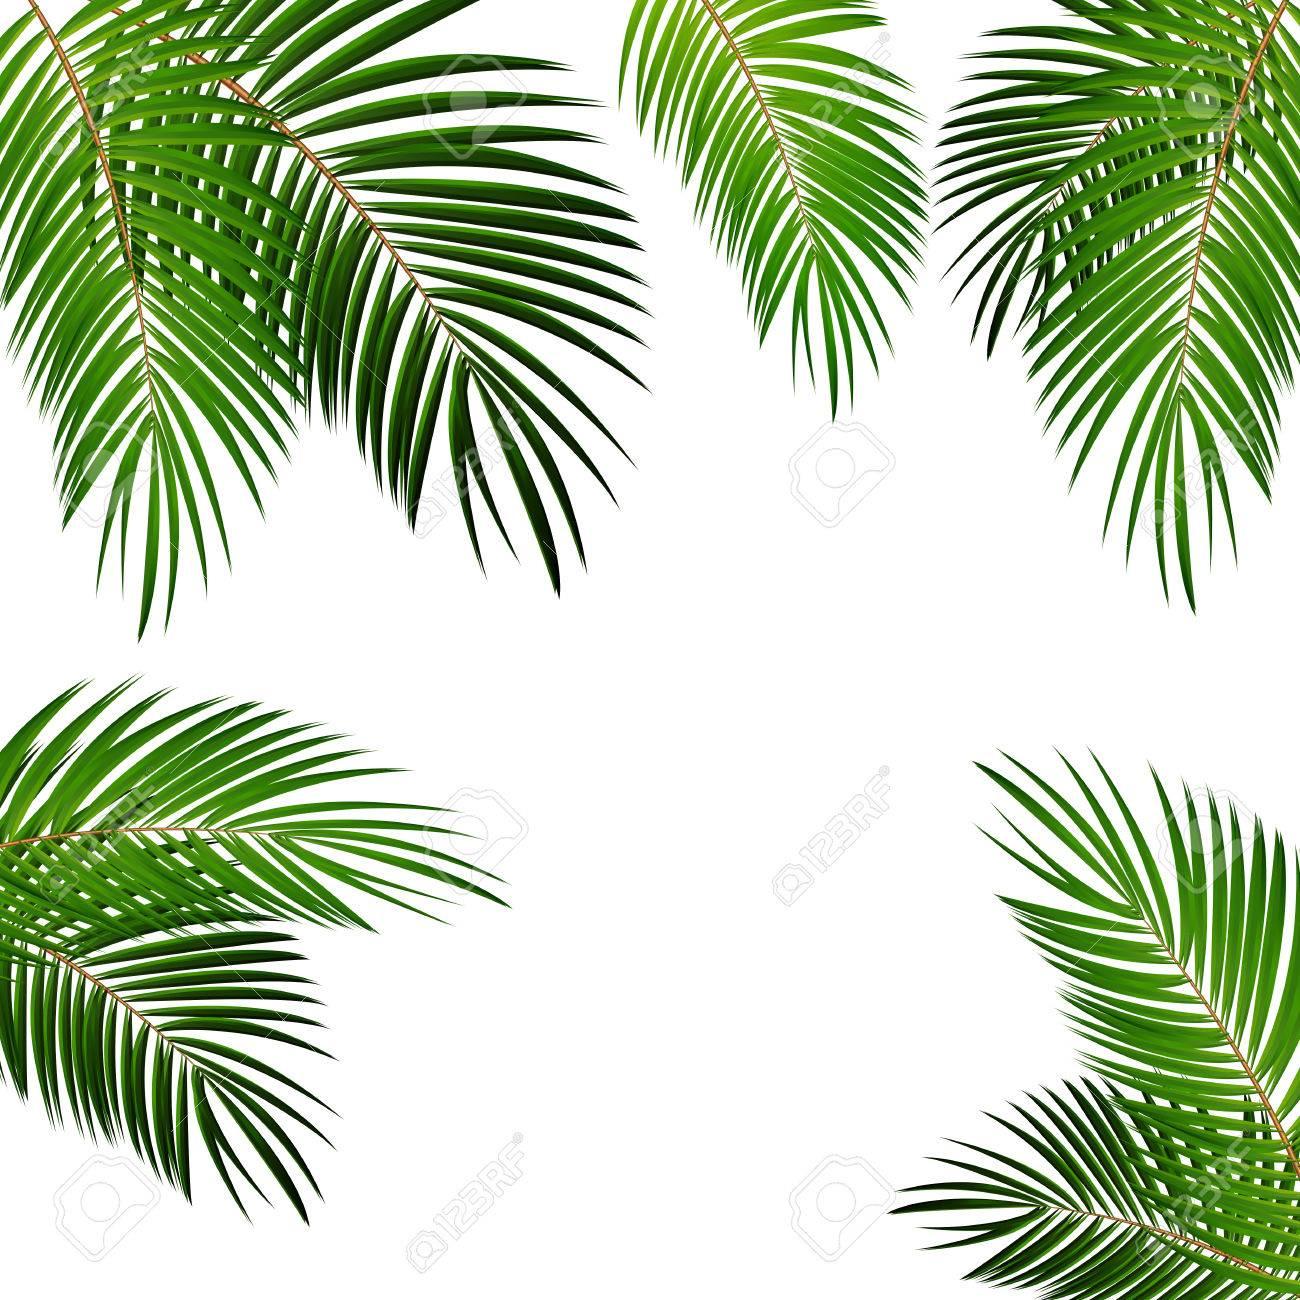 palm leaf vector background isolated illustration eps10 royalty free rh 123rf com palm leaf vector image palm leaf vector file